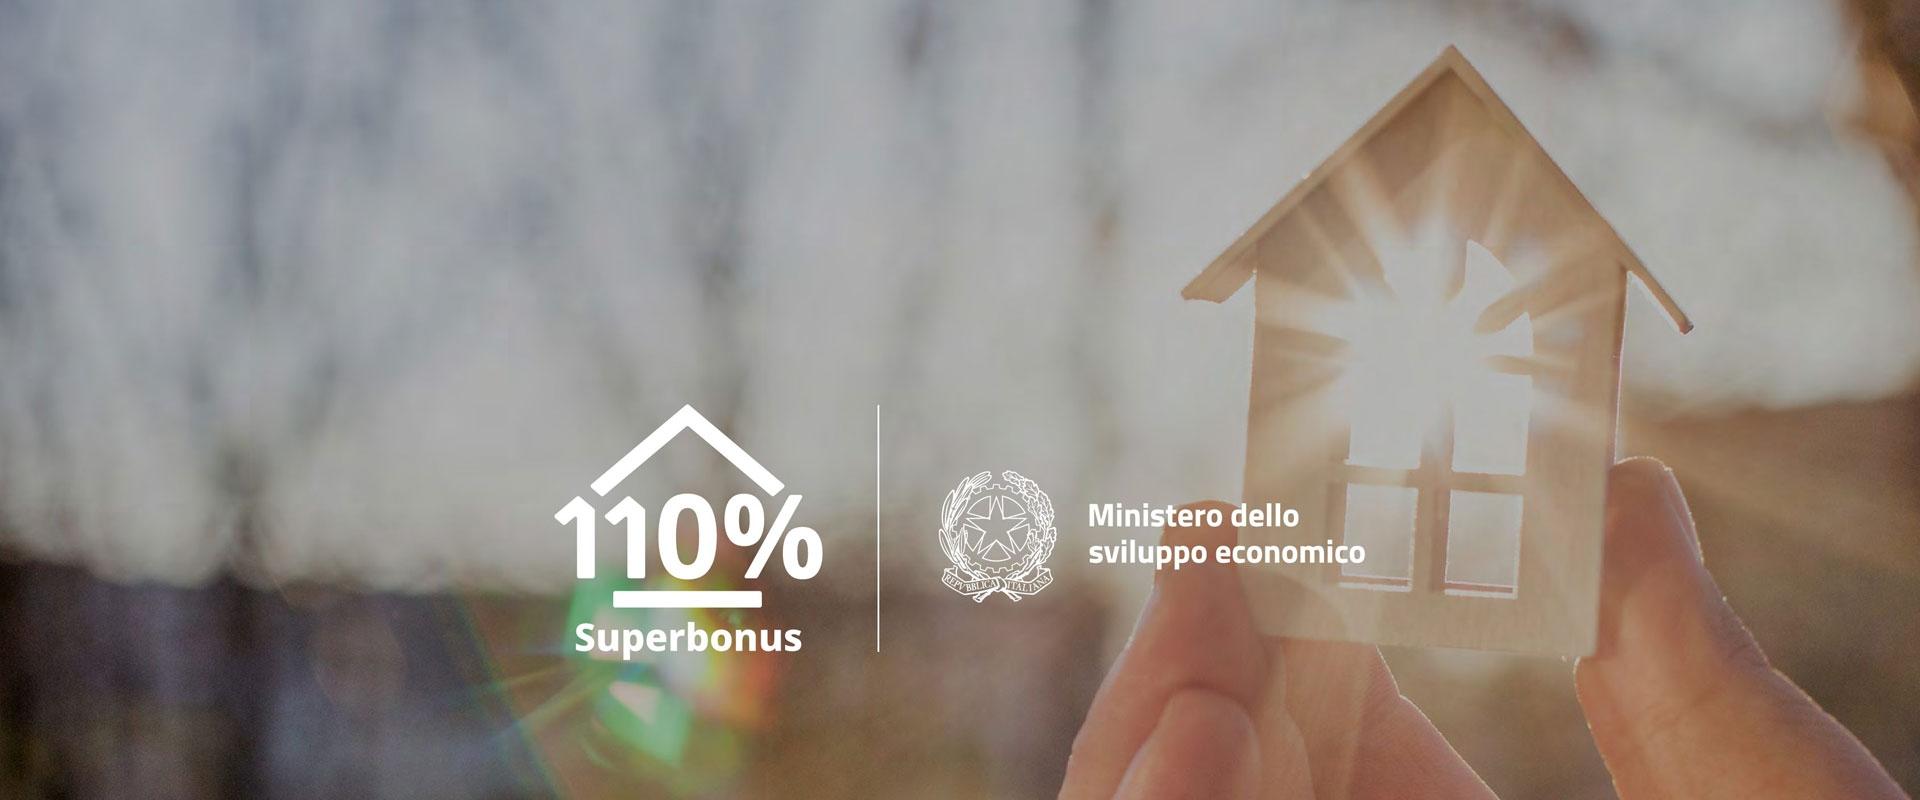 Superbonus 110% e sistemi di building automation